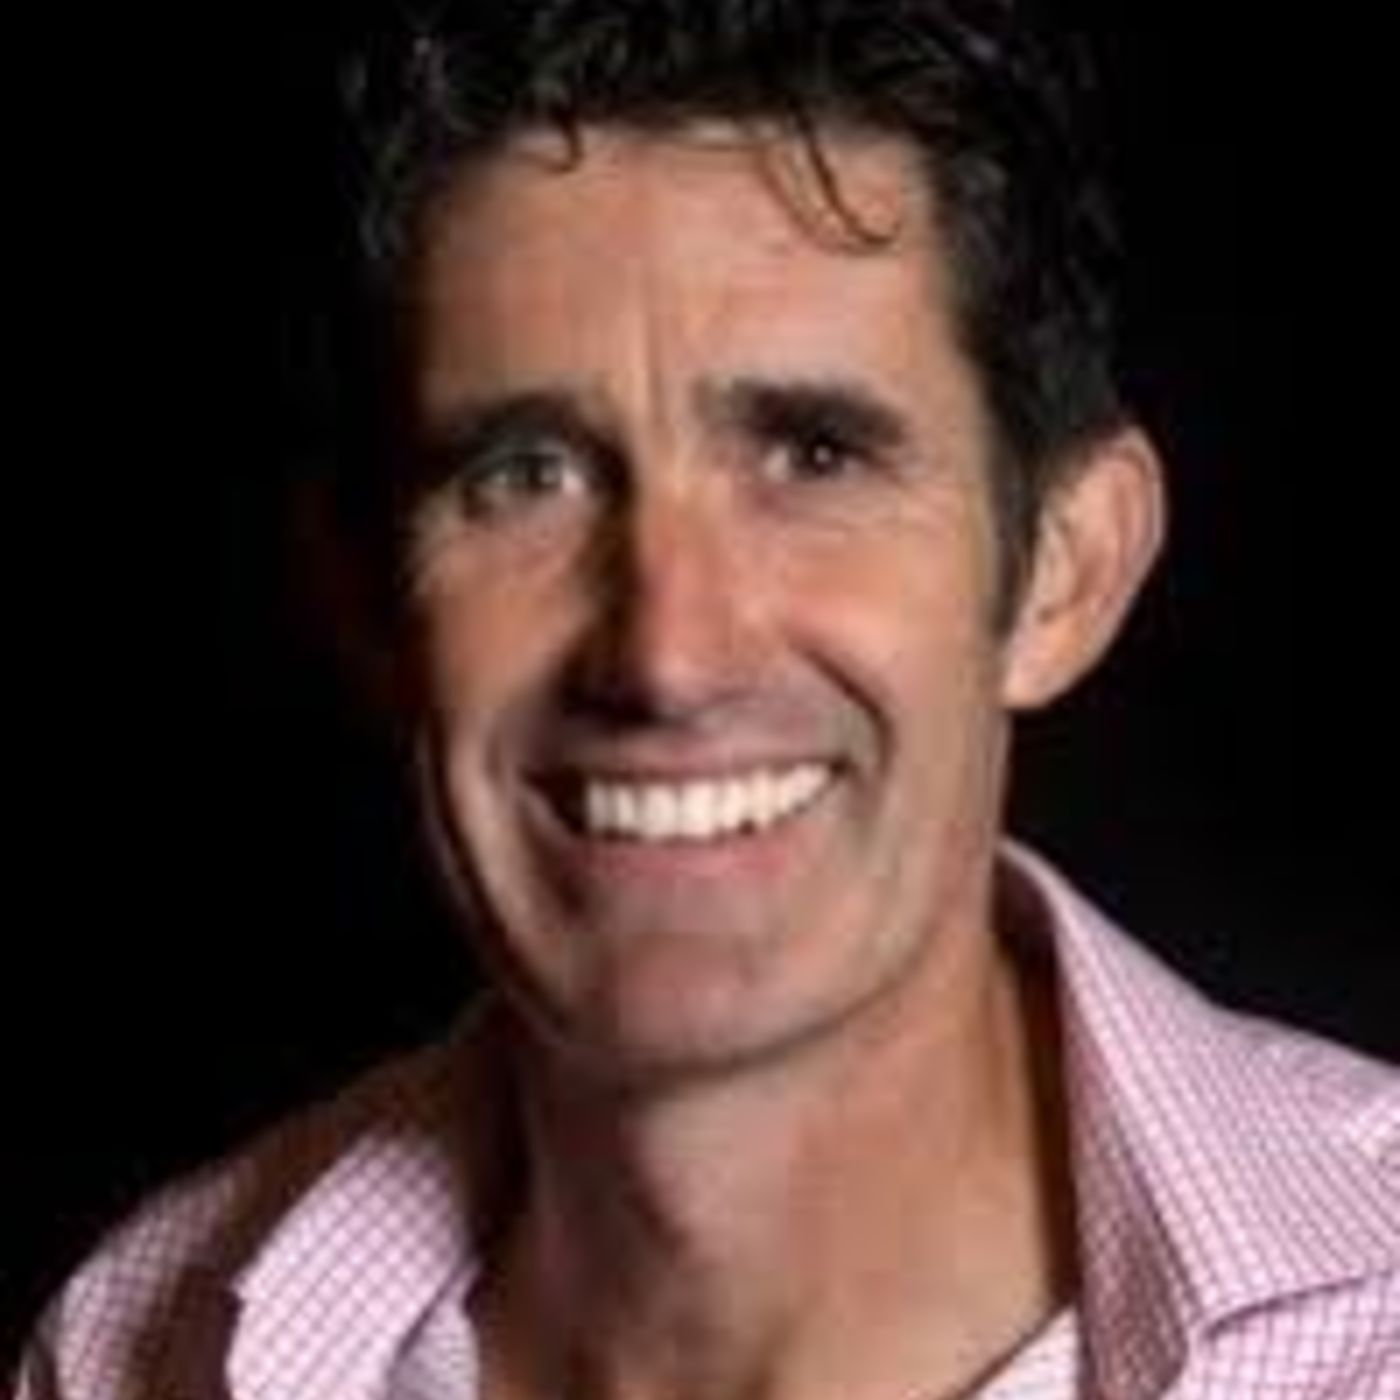 Mark 'Squiz' Squirrell - Former Commando turned humanitarian